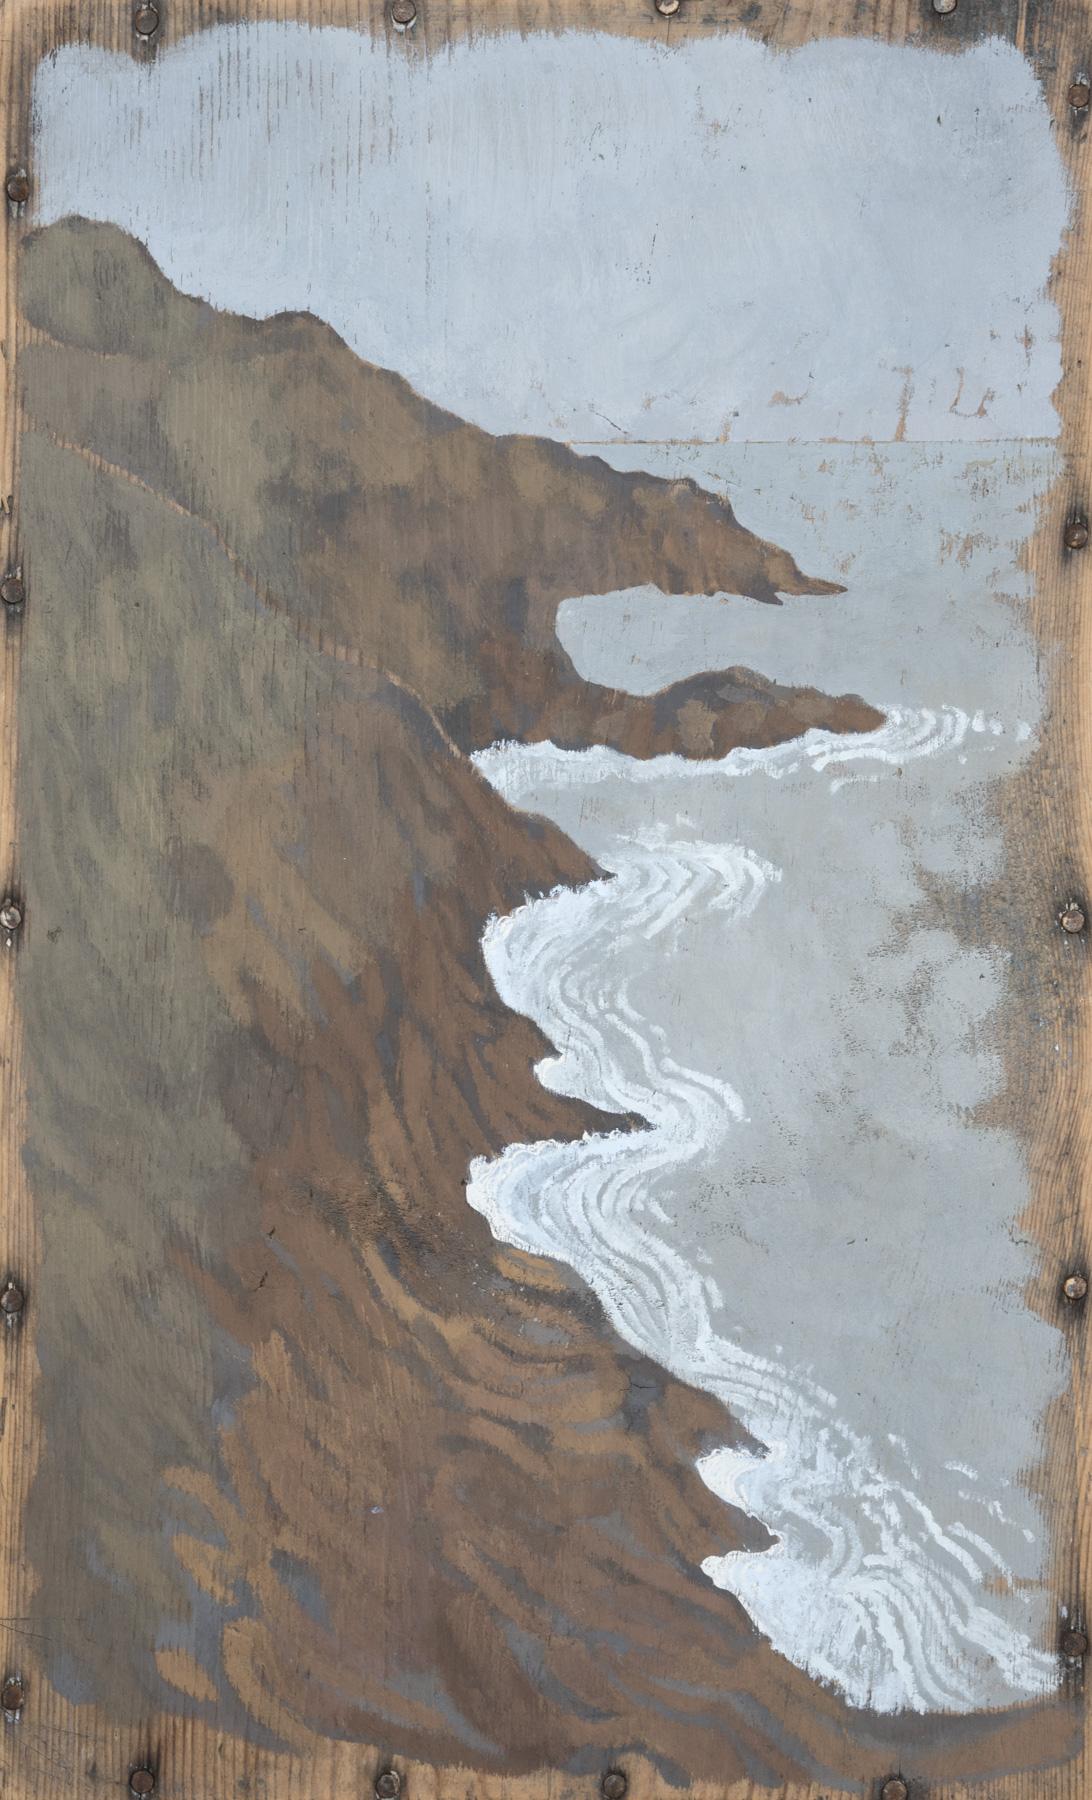 Coast  2013 27.5 x 44 cm · Gouache & tube watercolour on box lid